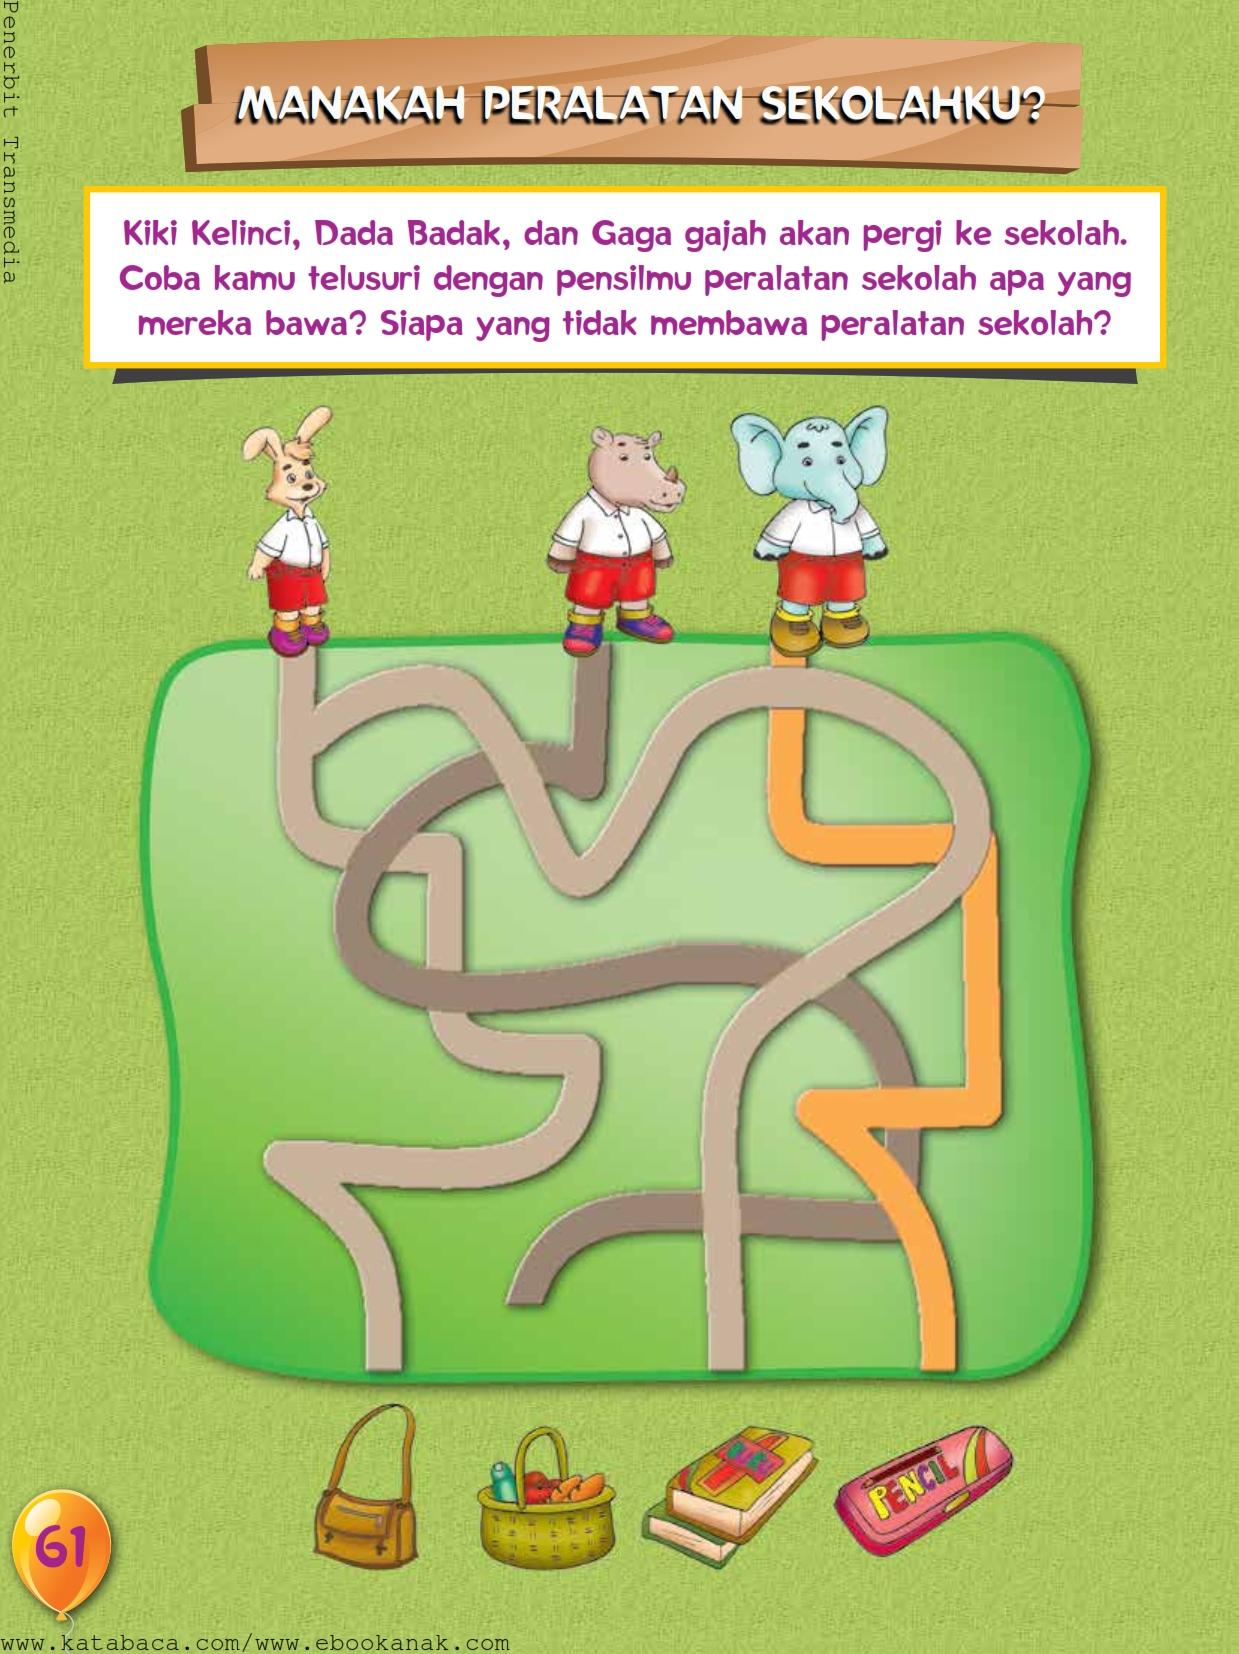 baca buku online, buku aktivitas anak jenius TK A B_064 mengenal nama-nama peralatan sekolah